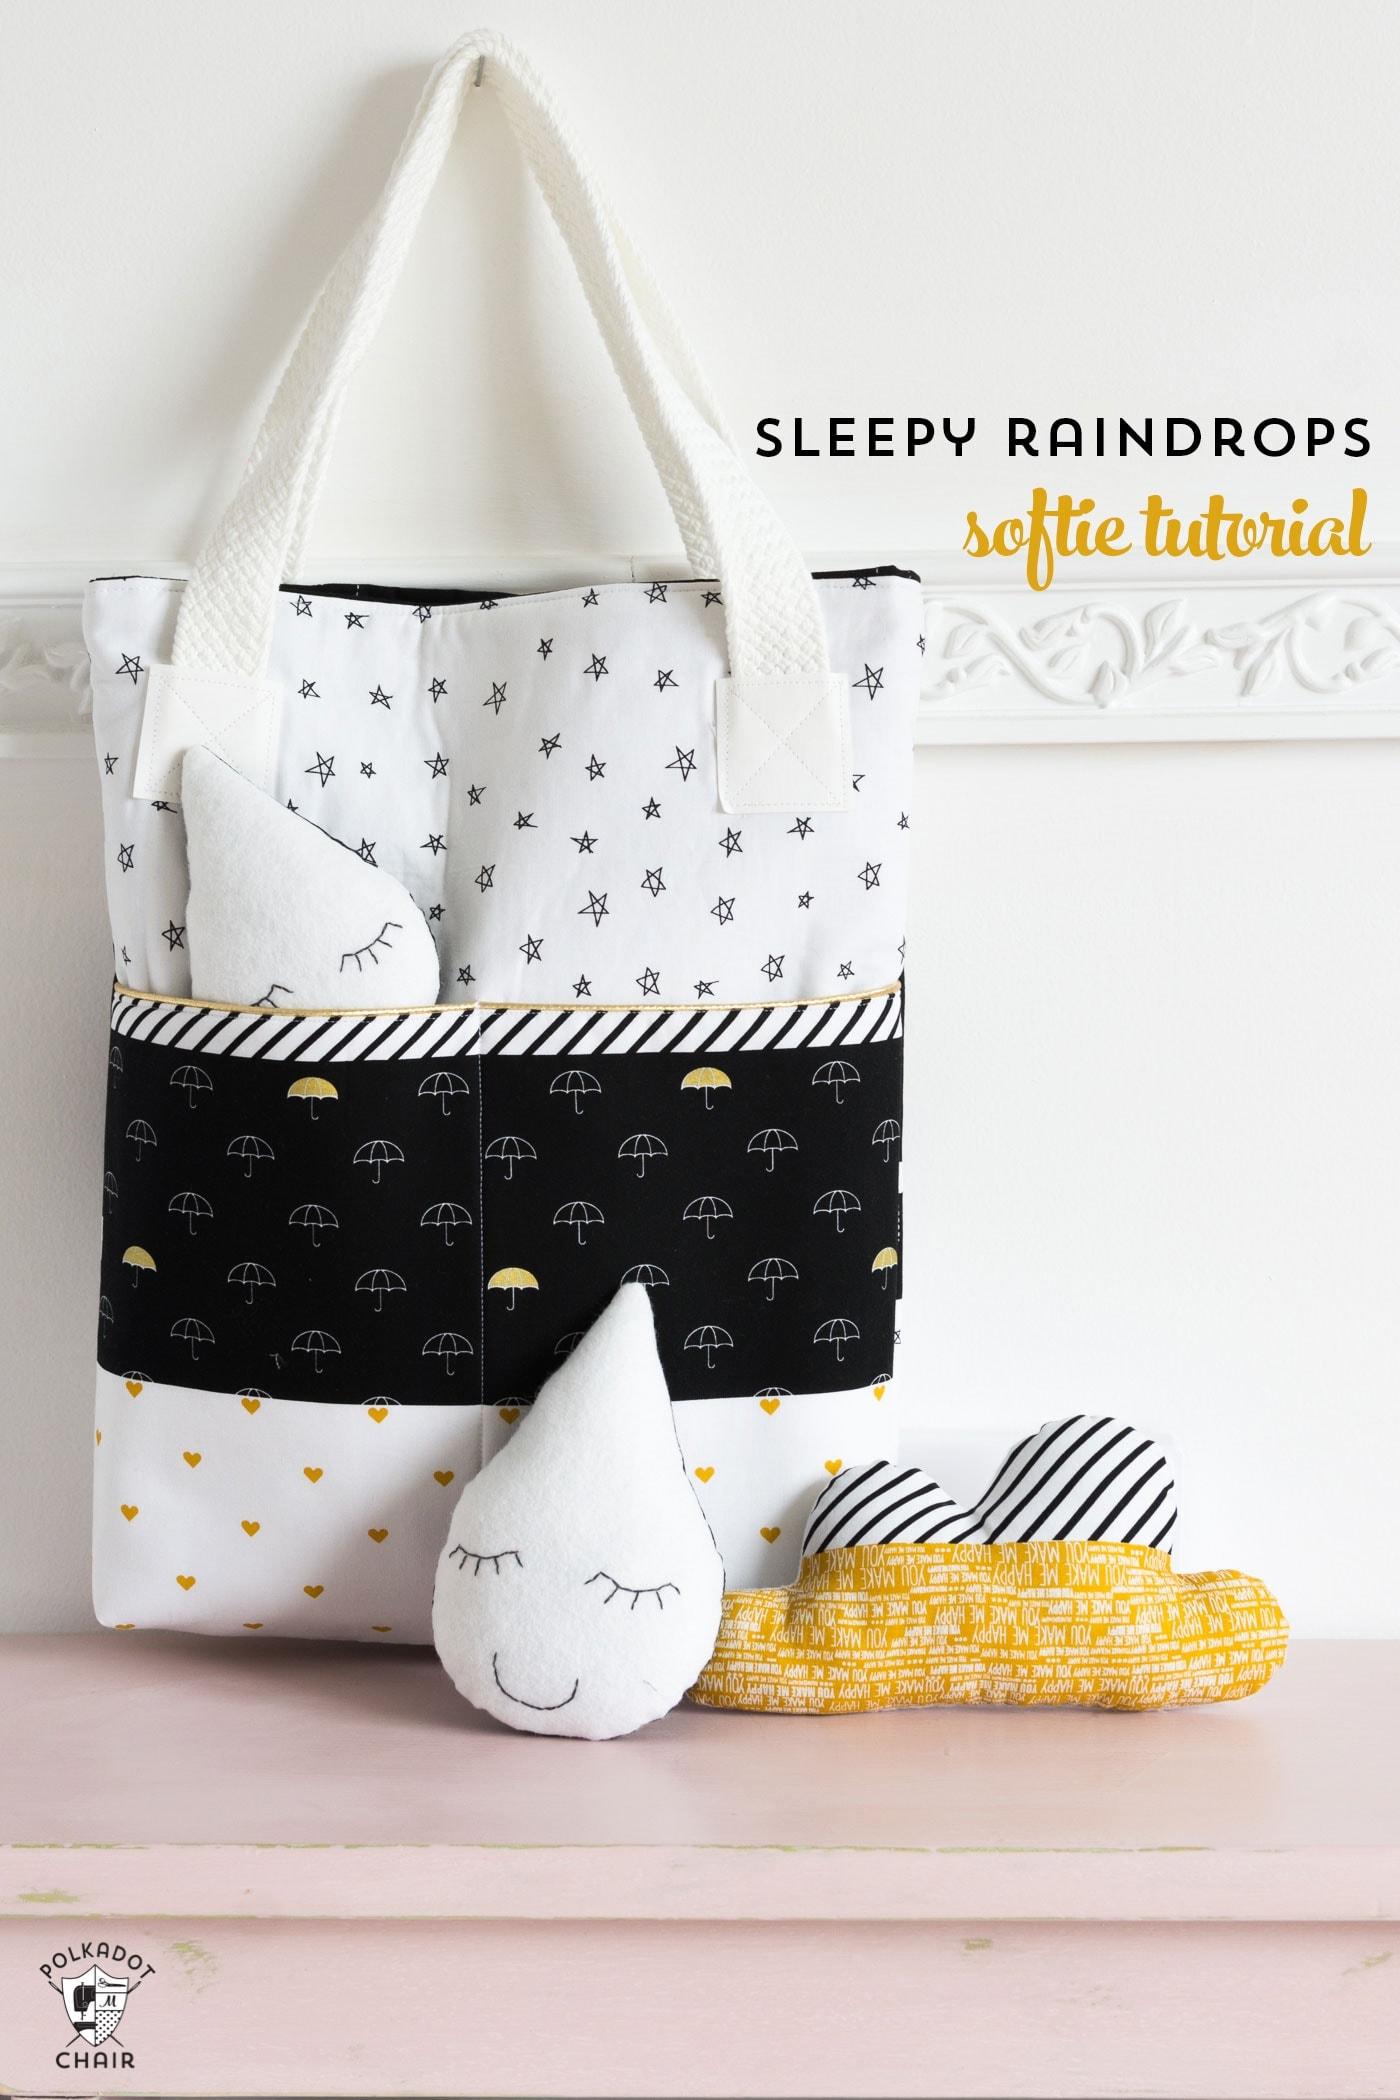 Sleepy Raindrops a free softie sewing pattern  The Polka